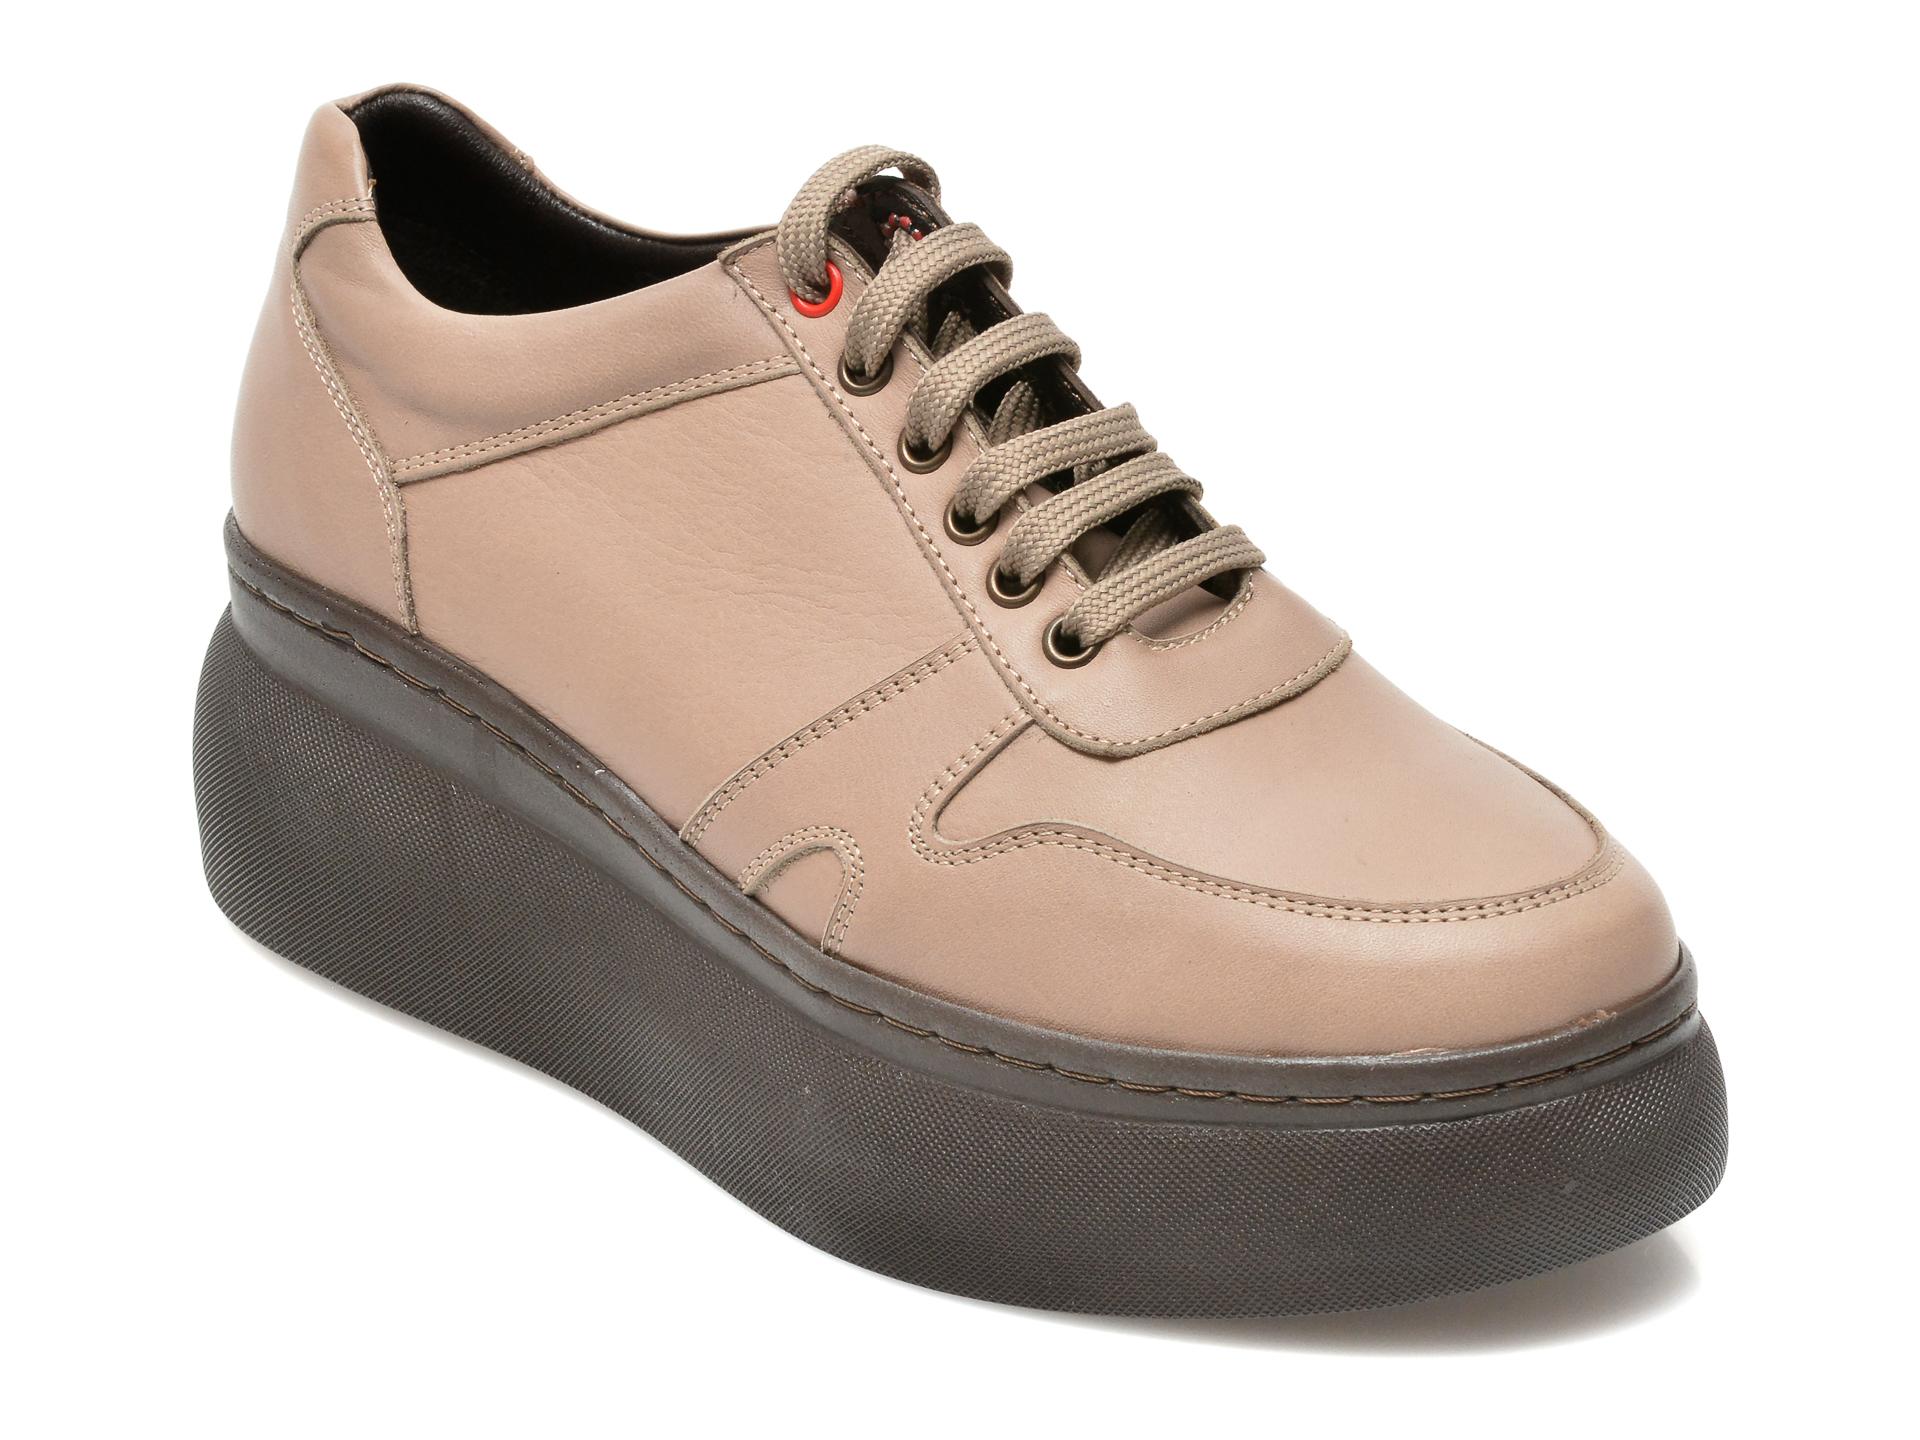 Pantofi Flavia Passini Gri, 21915, Din Piele Naturala